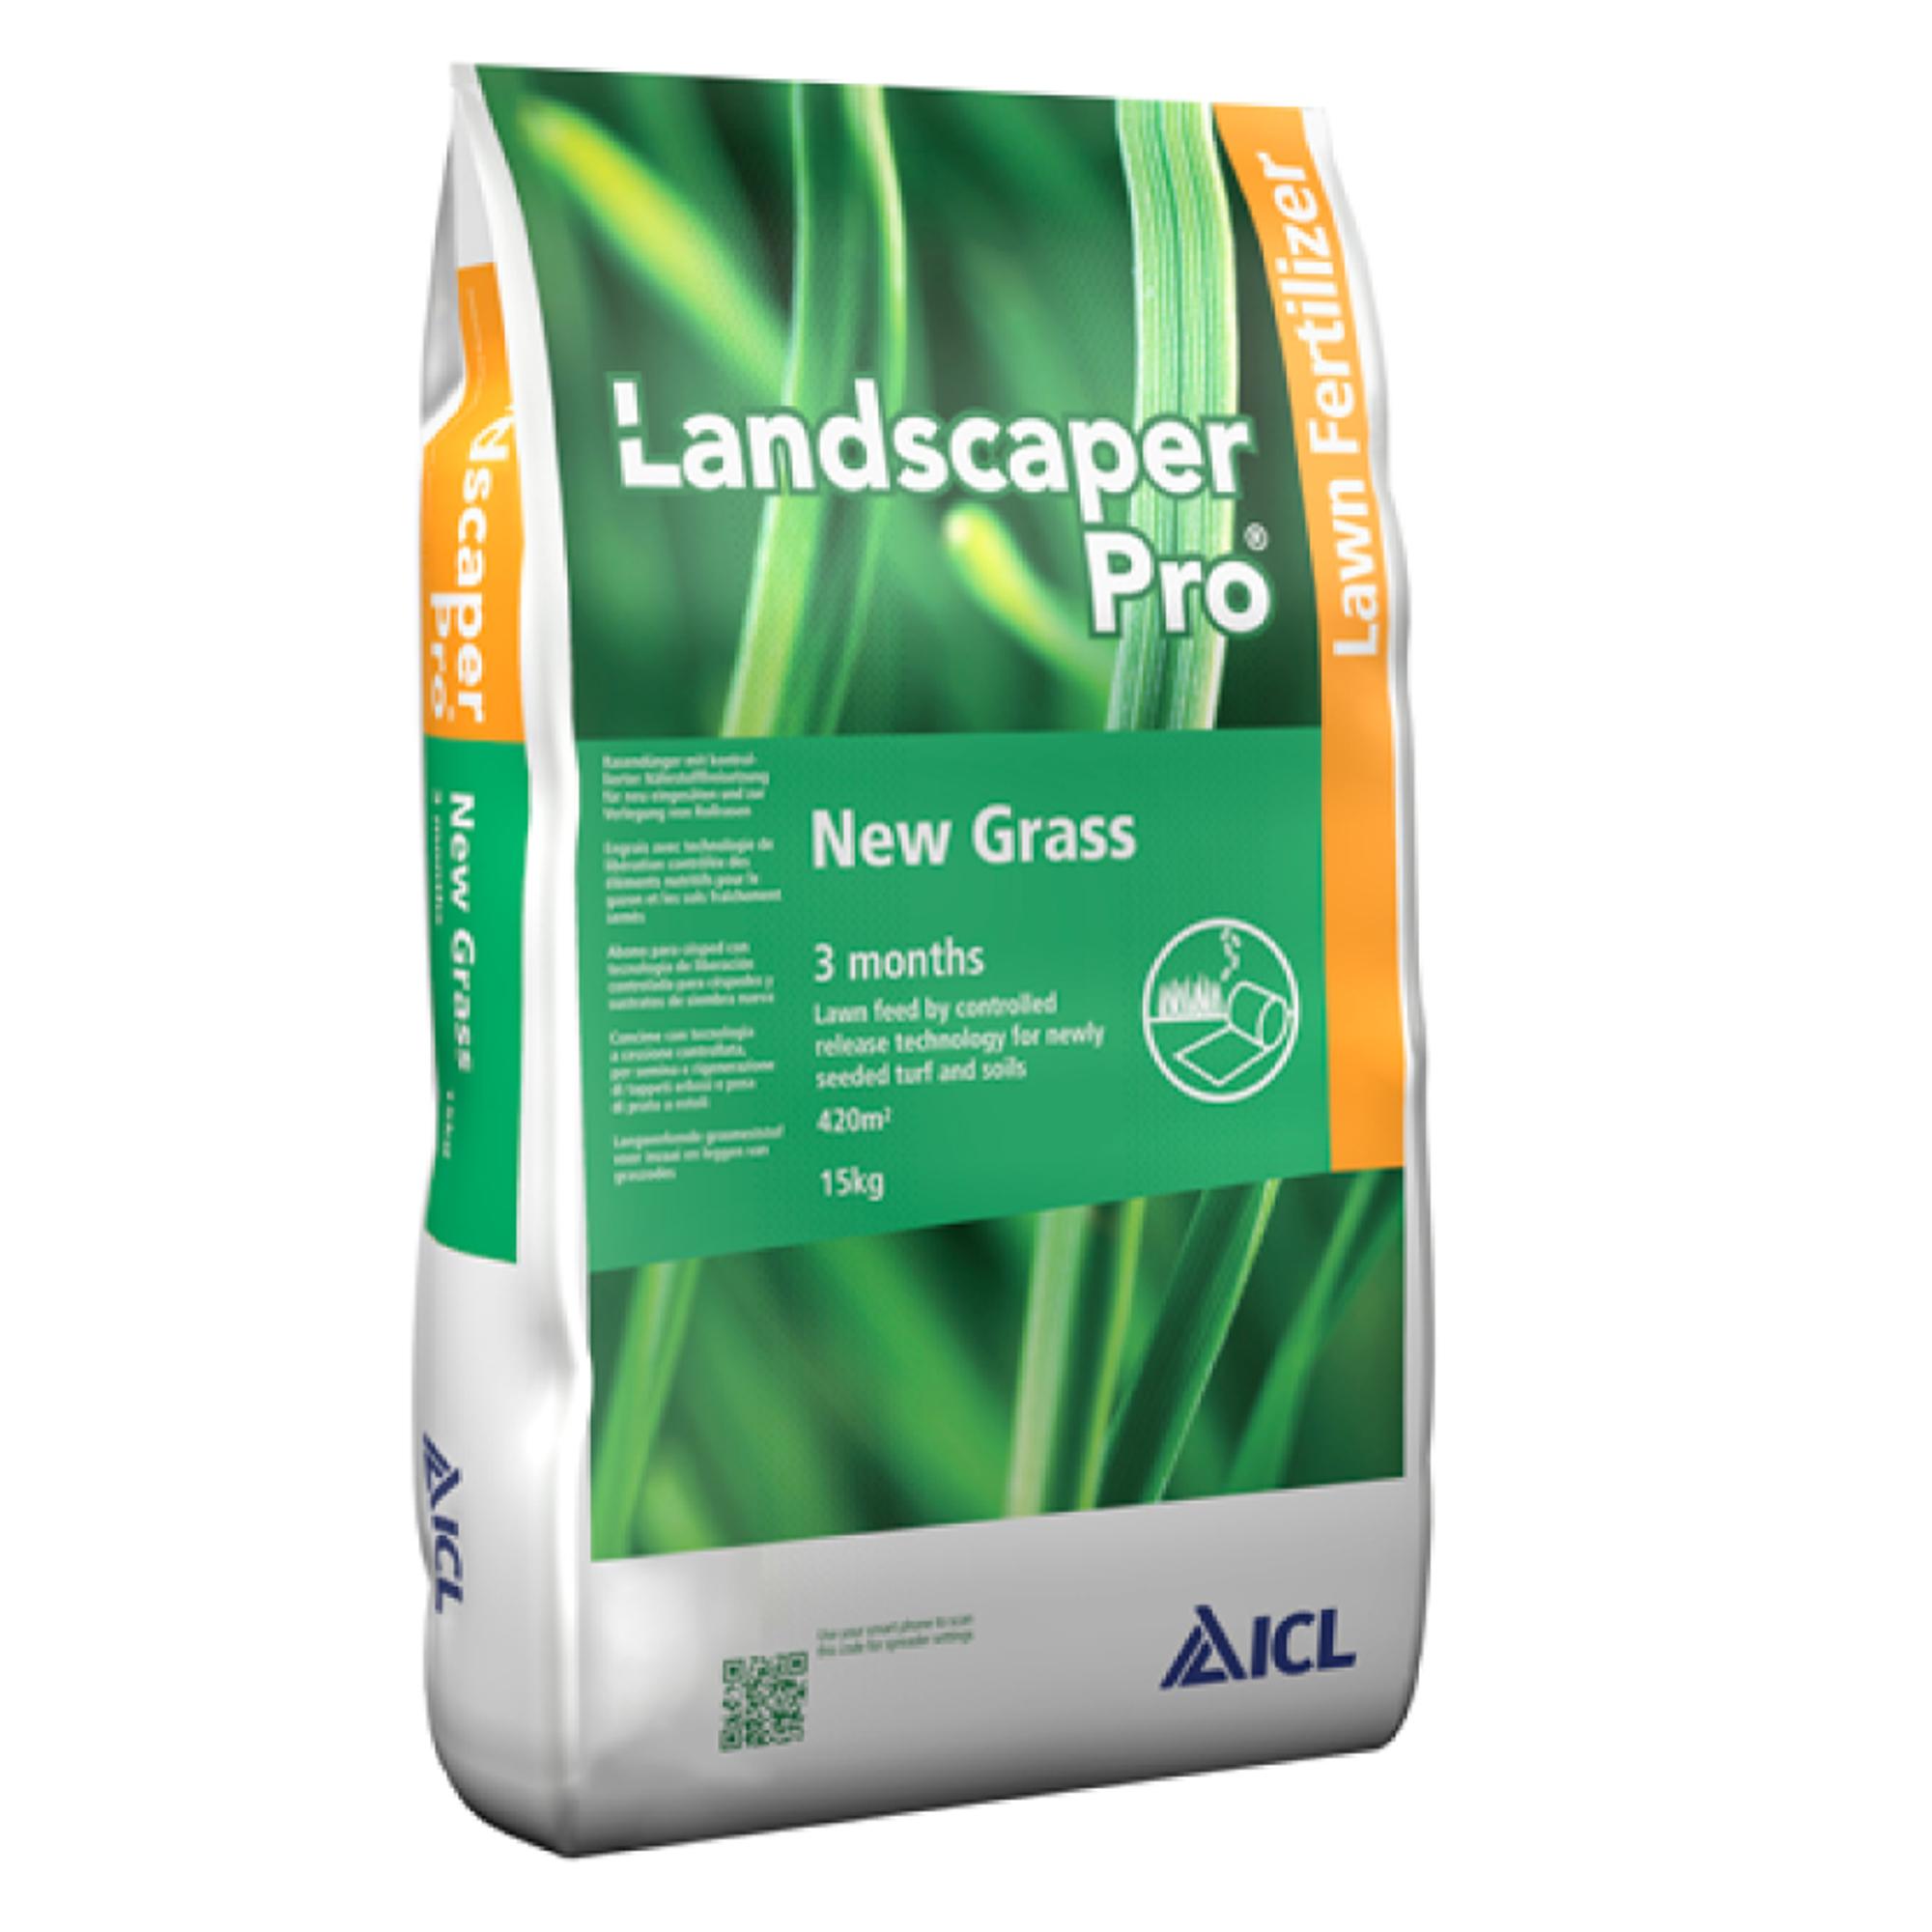 Landscaper Pro New Grass Gyepműtrágya 5807